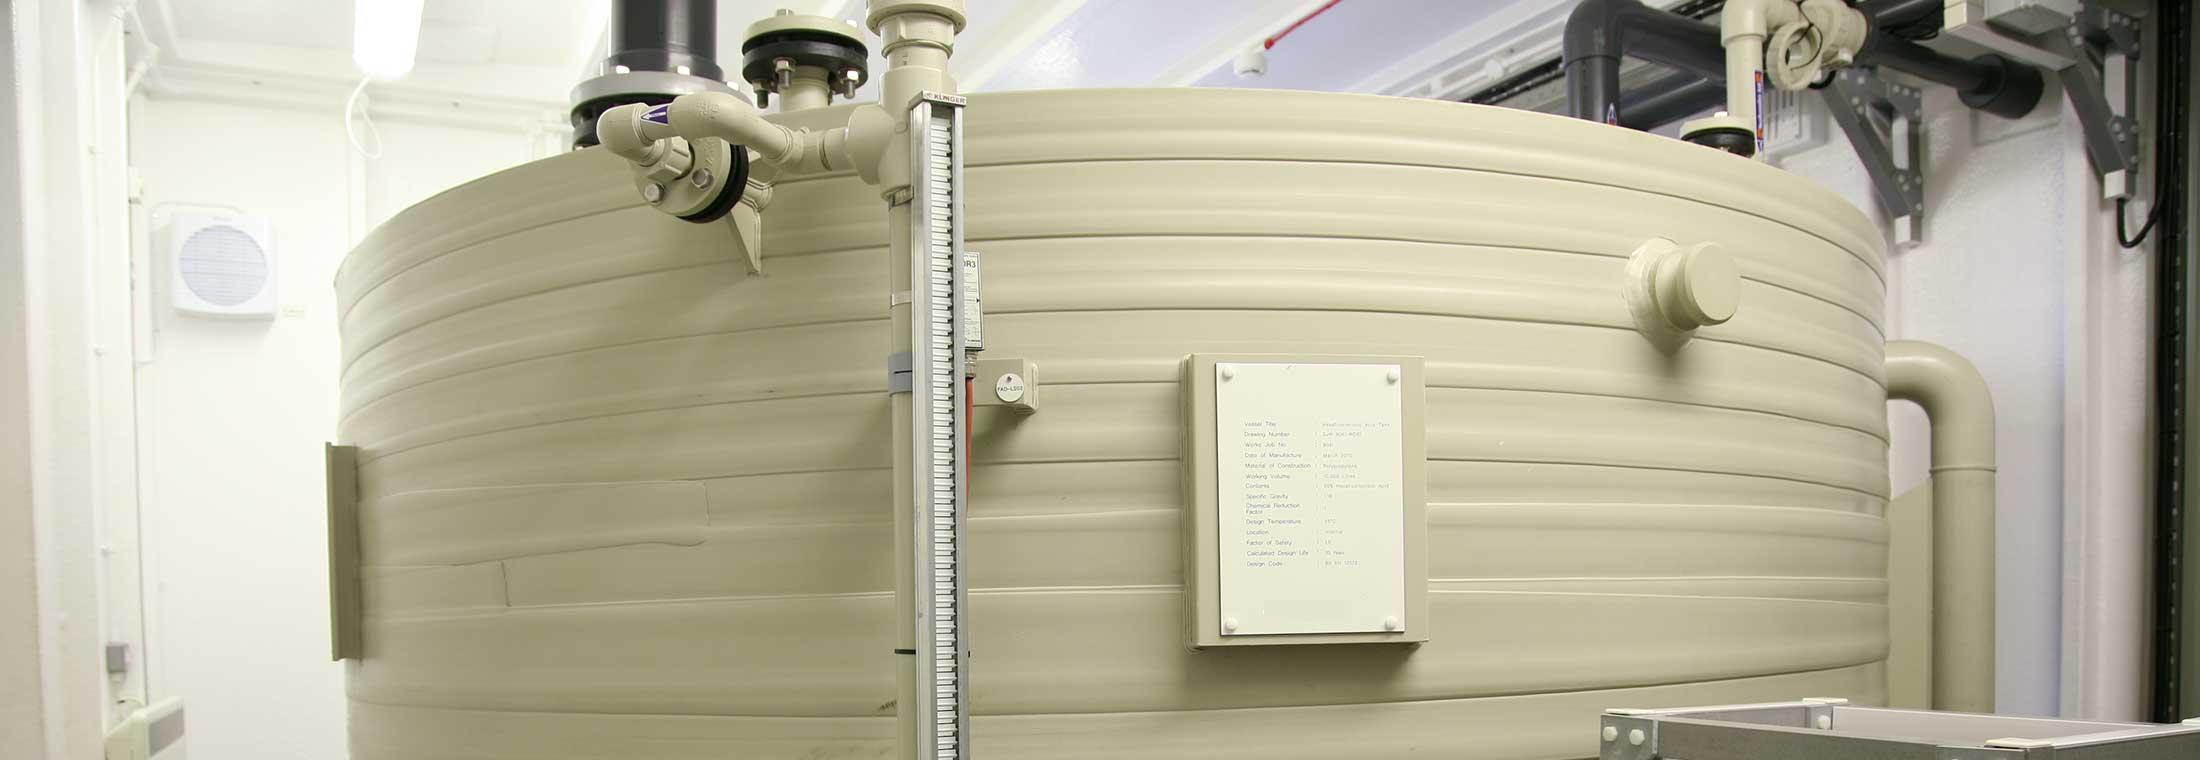 Storage Tanks. Caustic, Ferric, Fluoride, P Removal